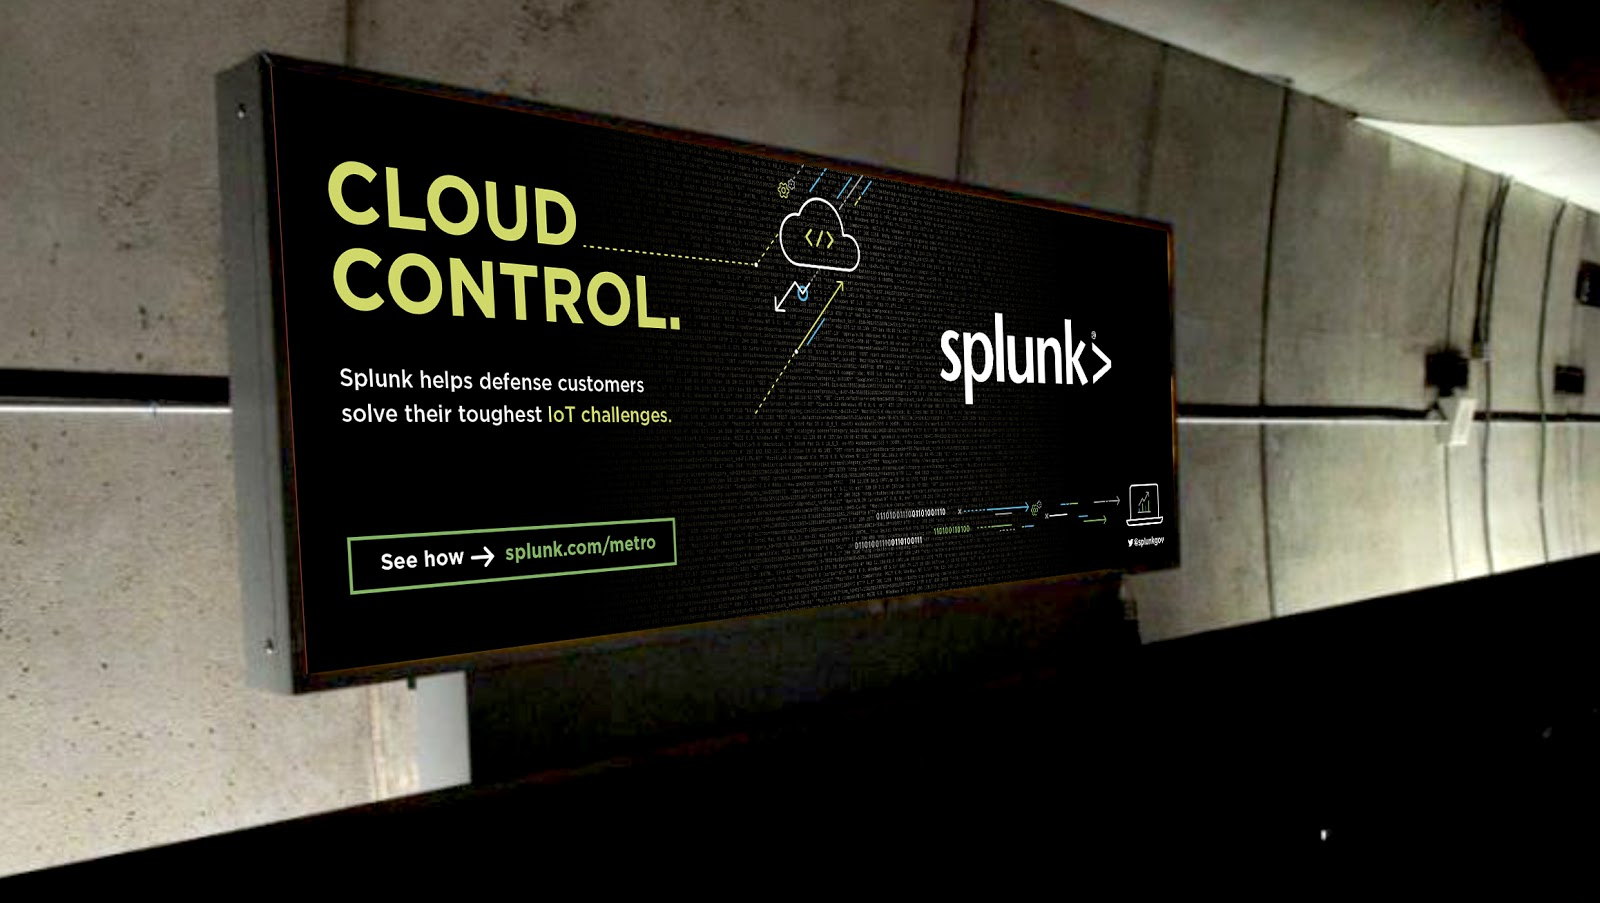 SPLUNK-DC-Metro-Pentagon-Station_Takeover-124x43.jpg